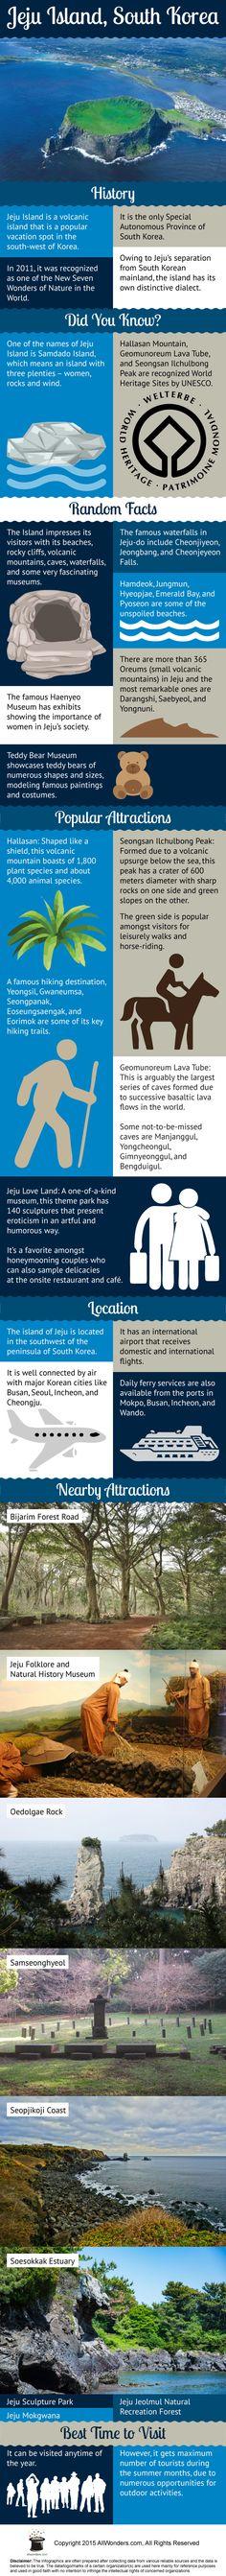 About Jeju Island - Infographic | ce petit cochon | travel | jeju island korea